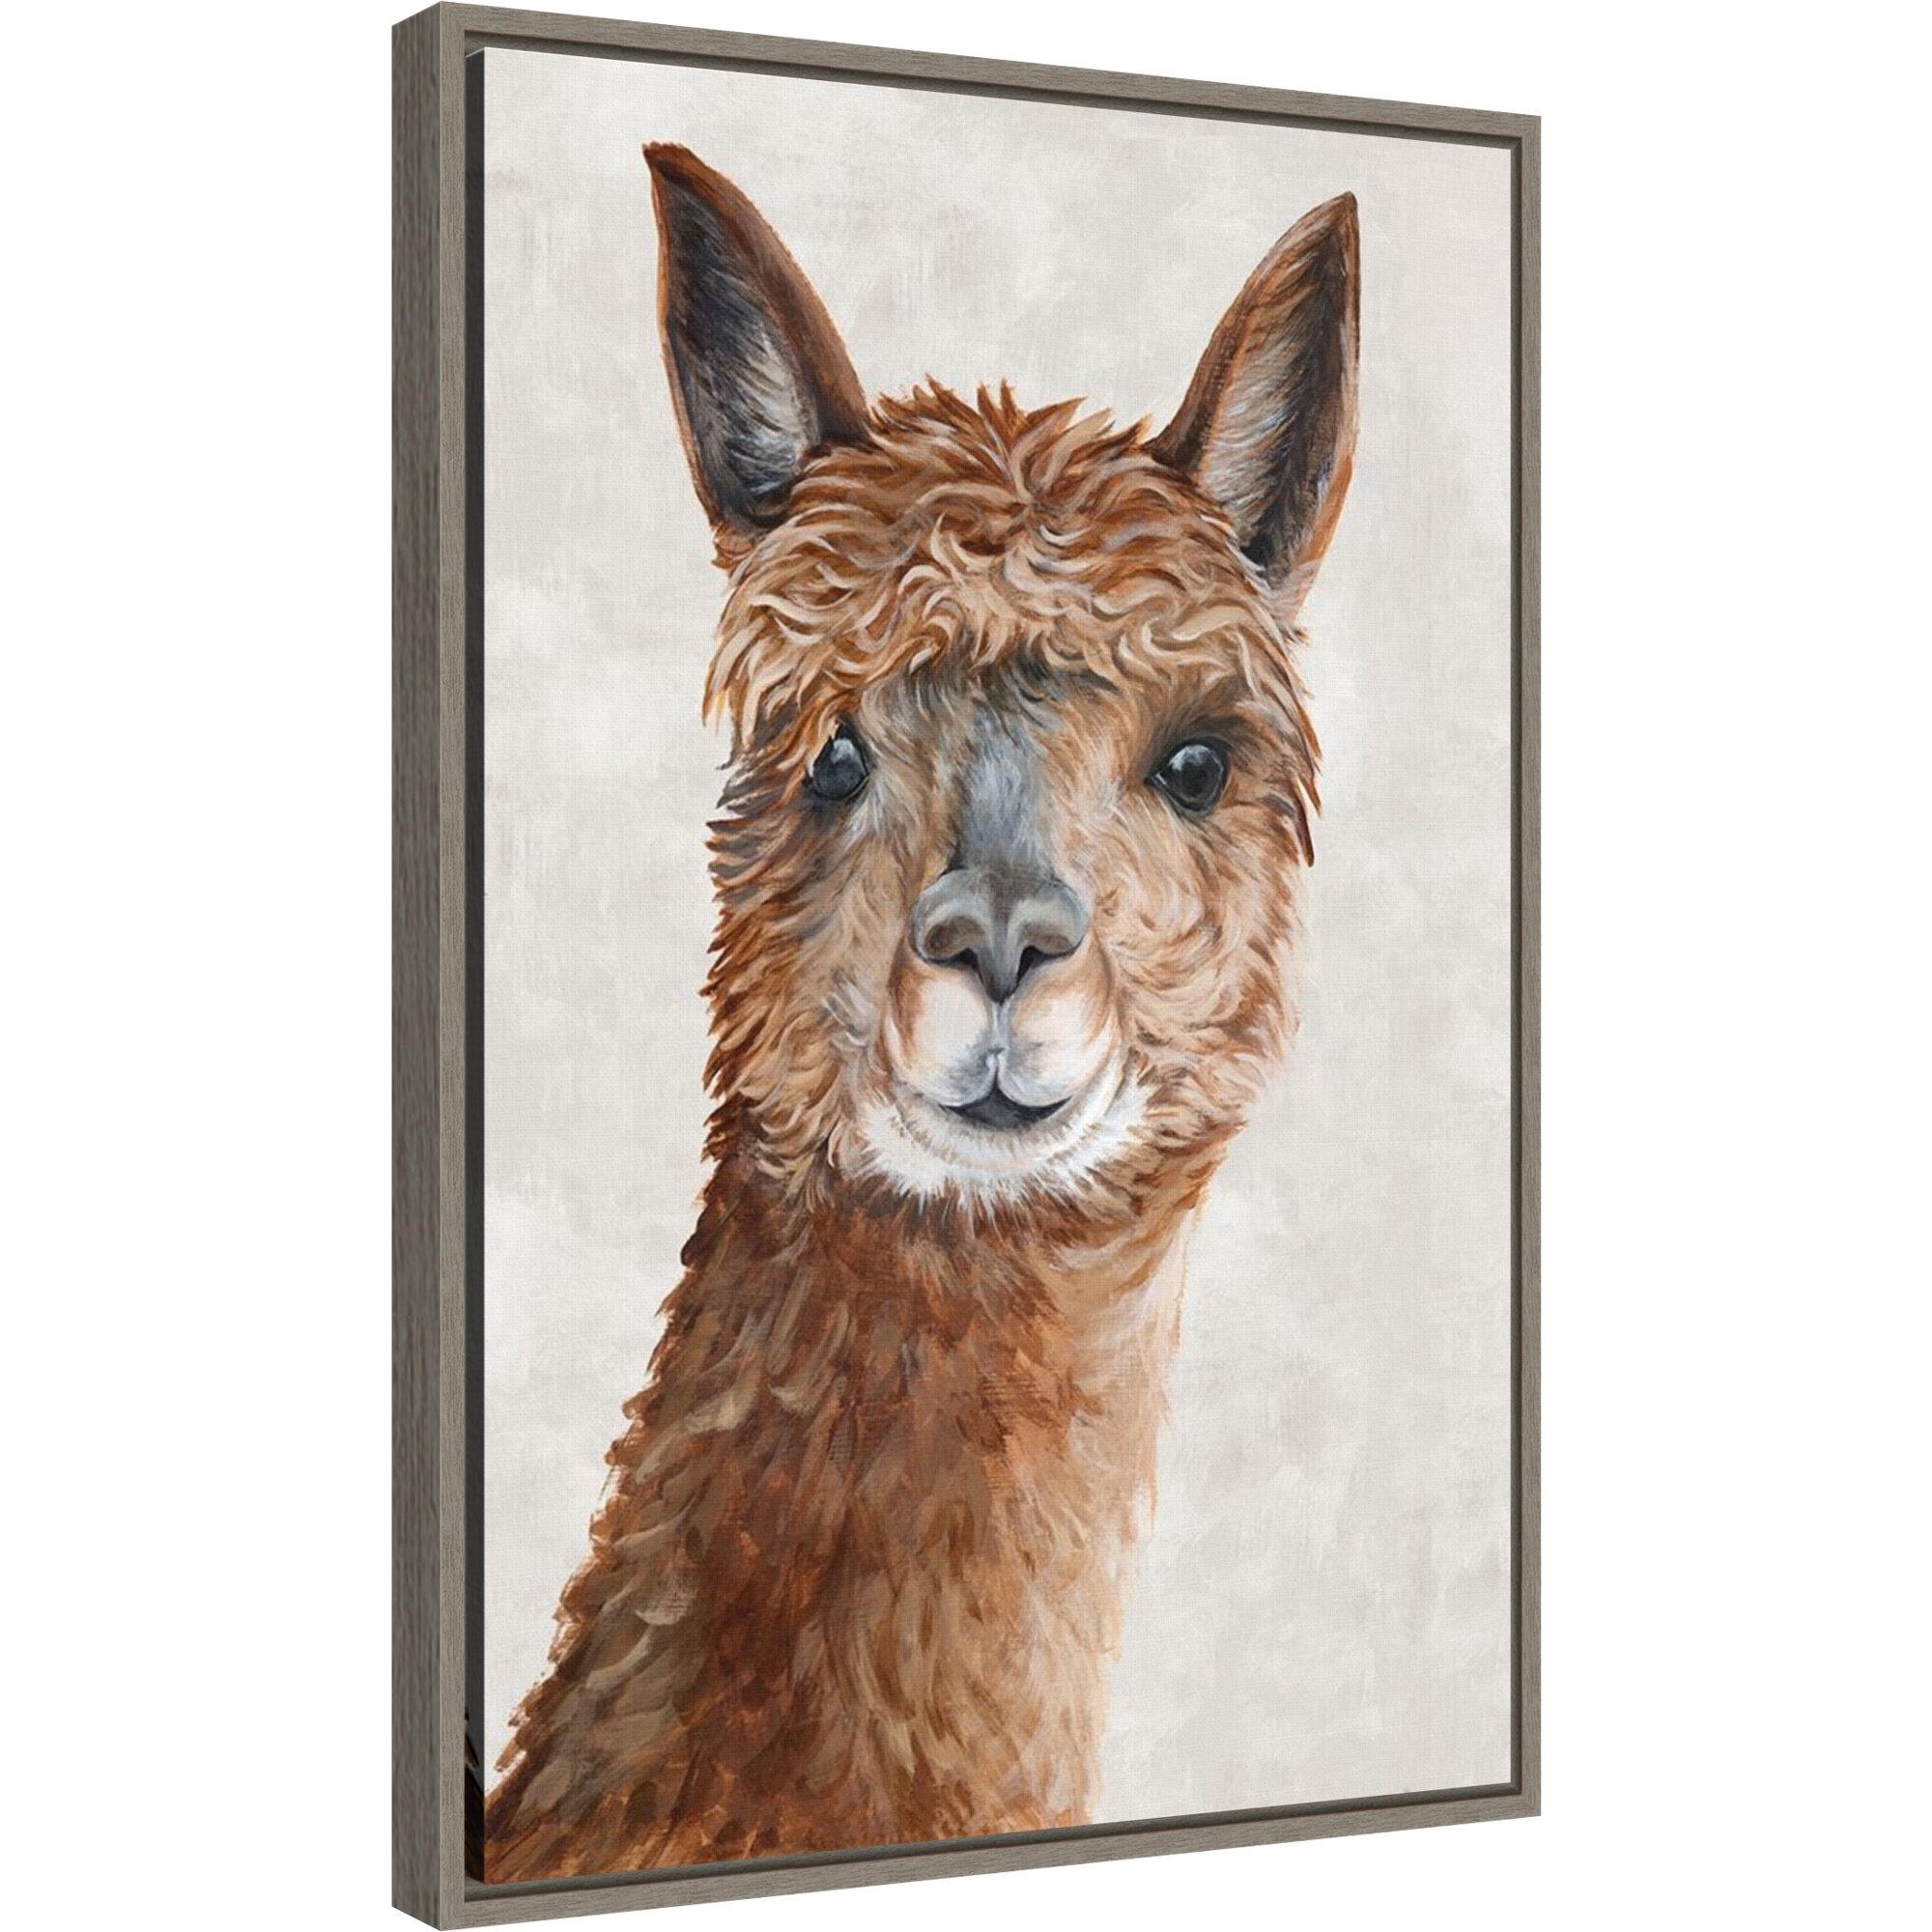 Bloomsbury Market Suri Alpaca Ii By Eva Watts Floater Frame Painting Print On Canvas Wayfair